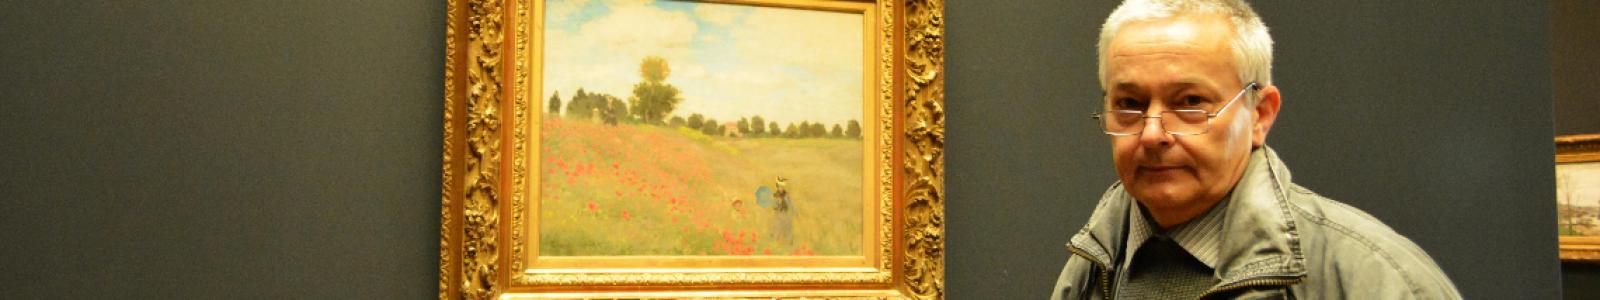 Gallery Painter Vladimir Kolesnik